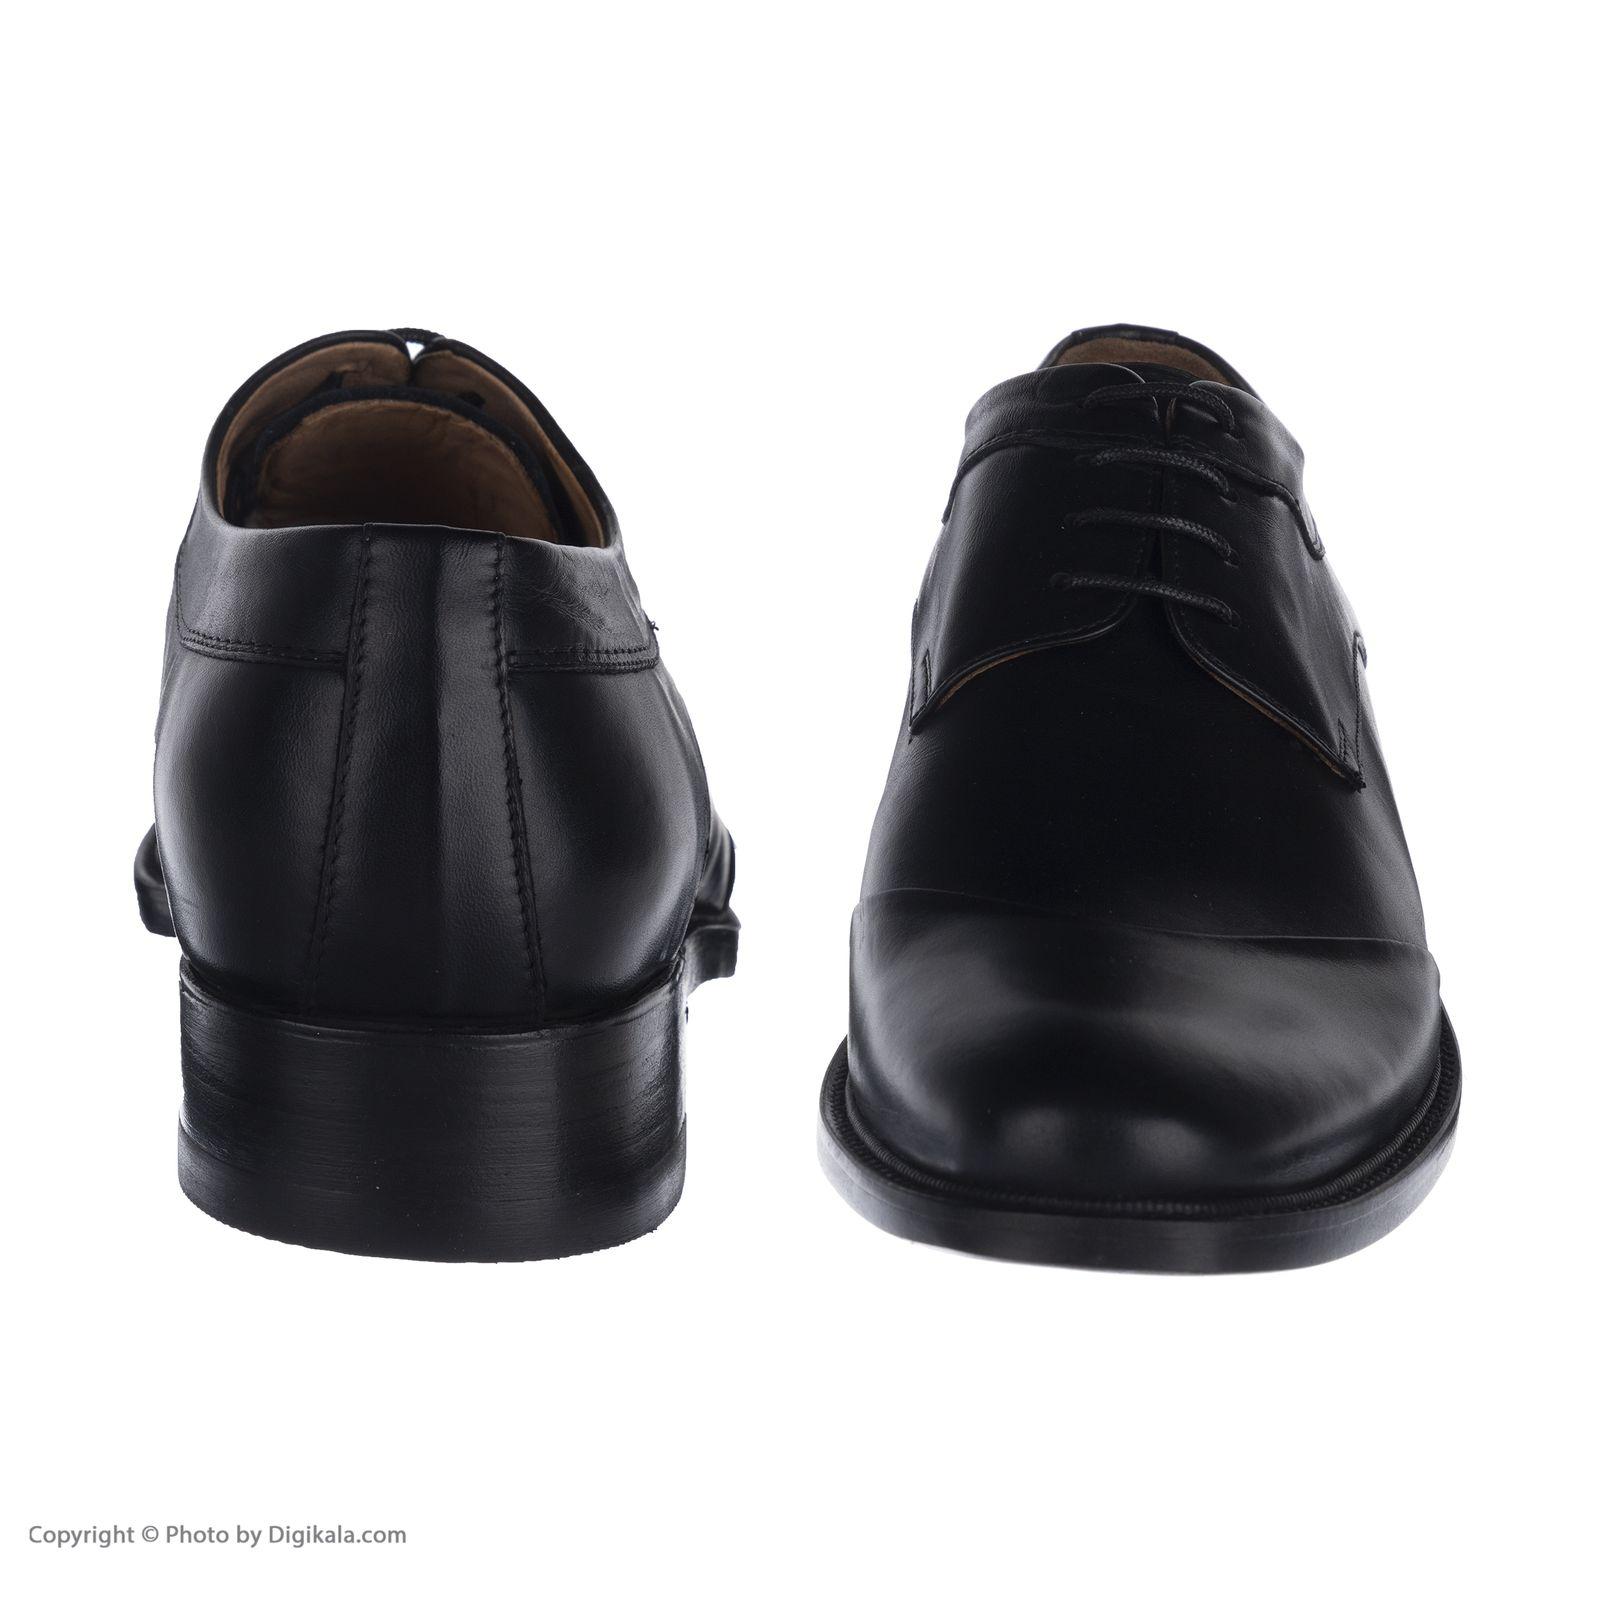 کفش مردانه نظری کد 423 -  - 2